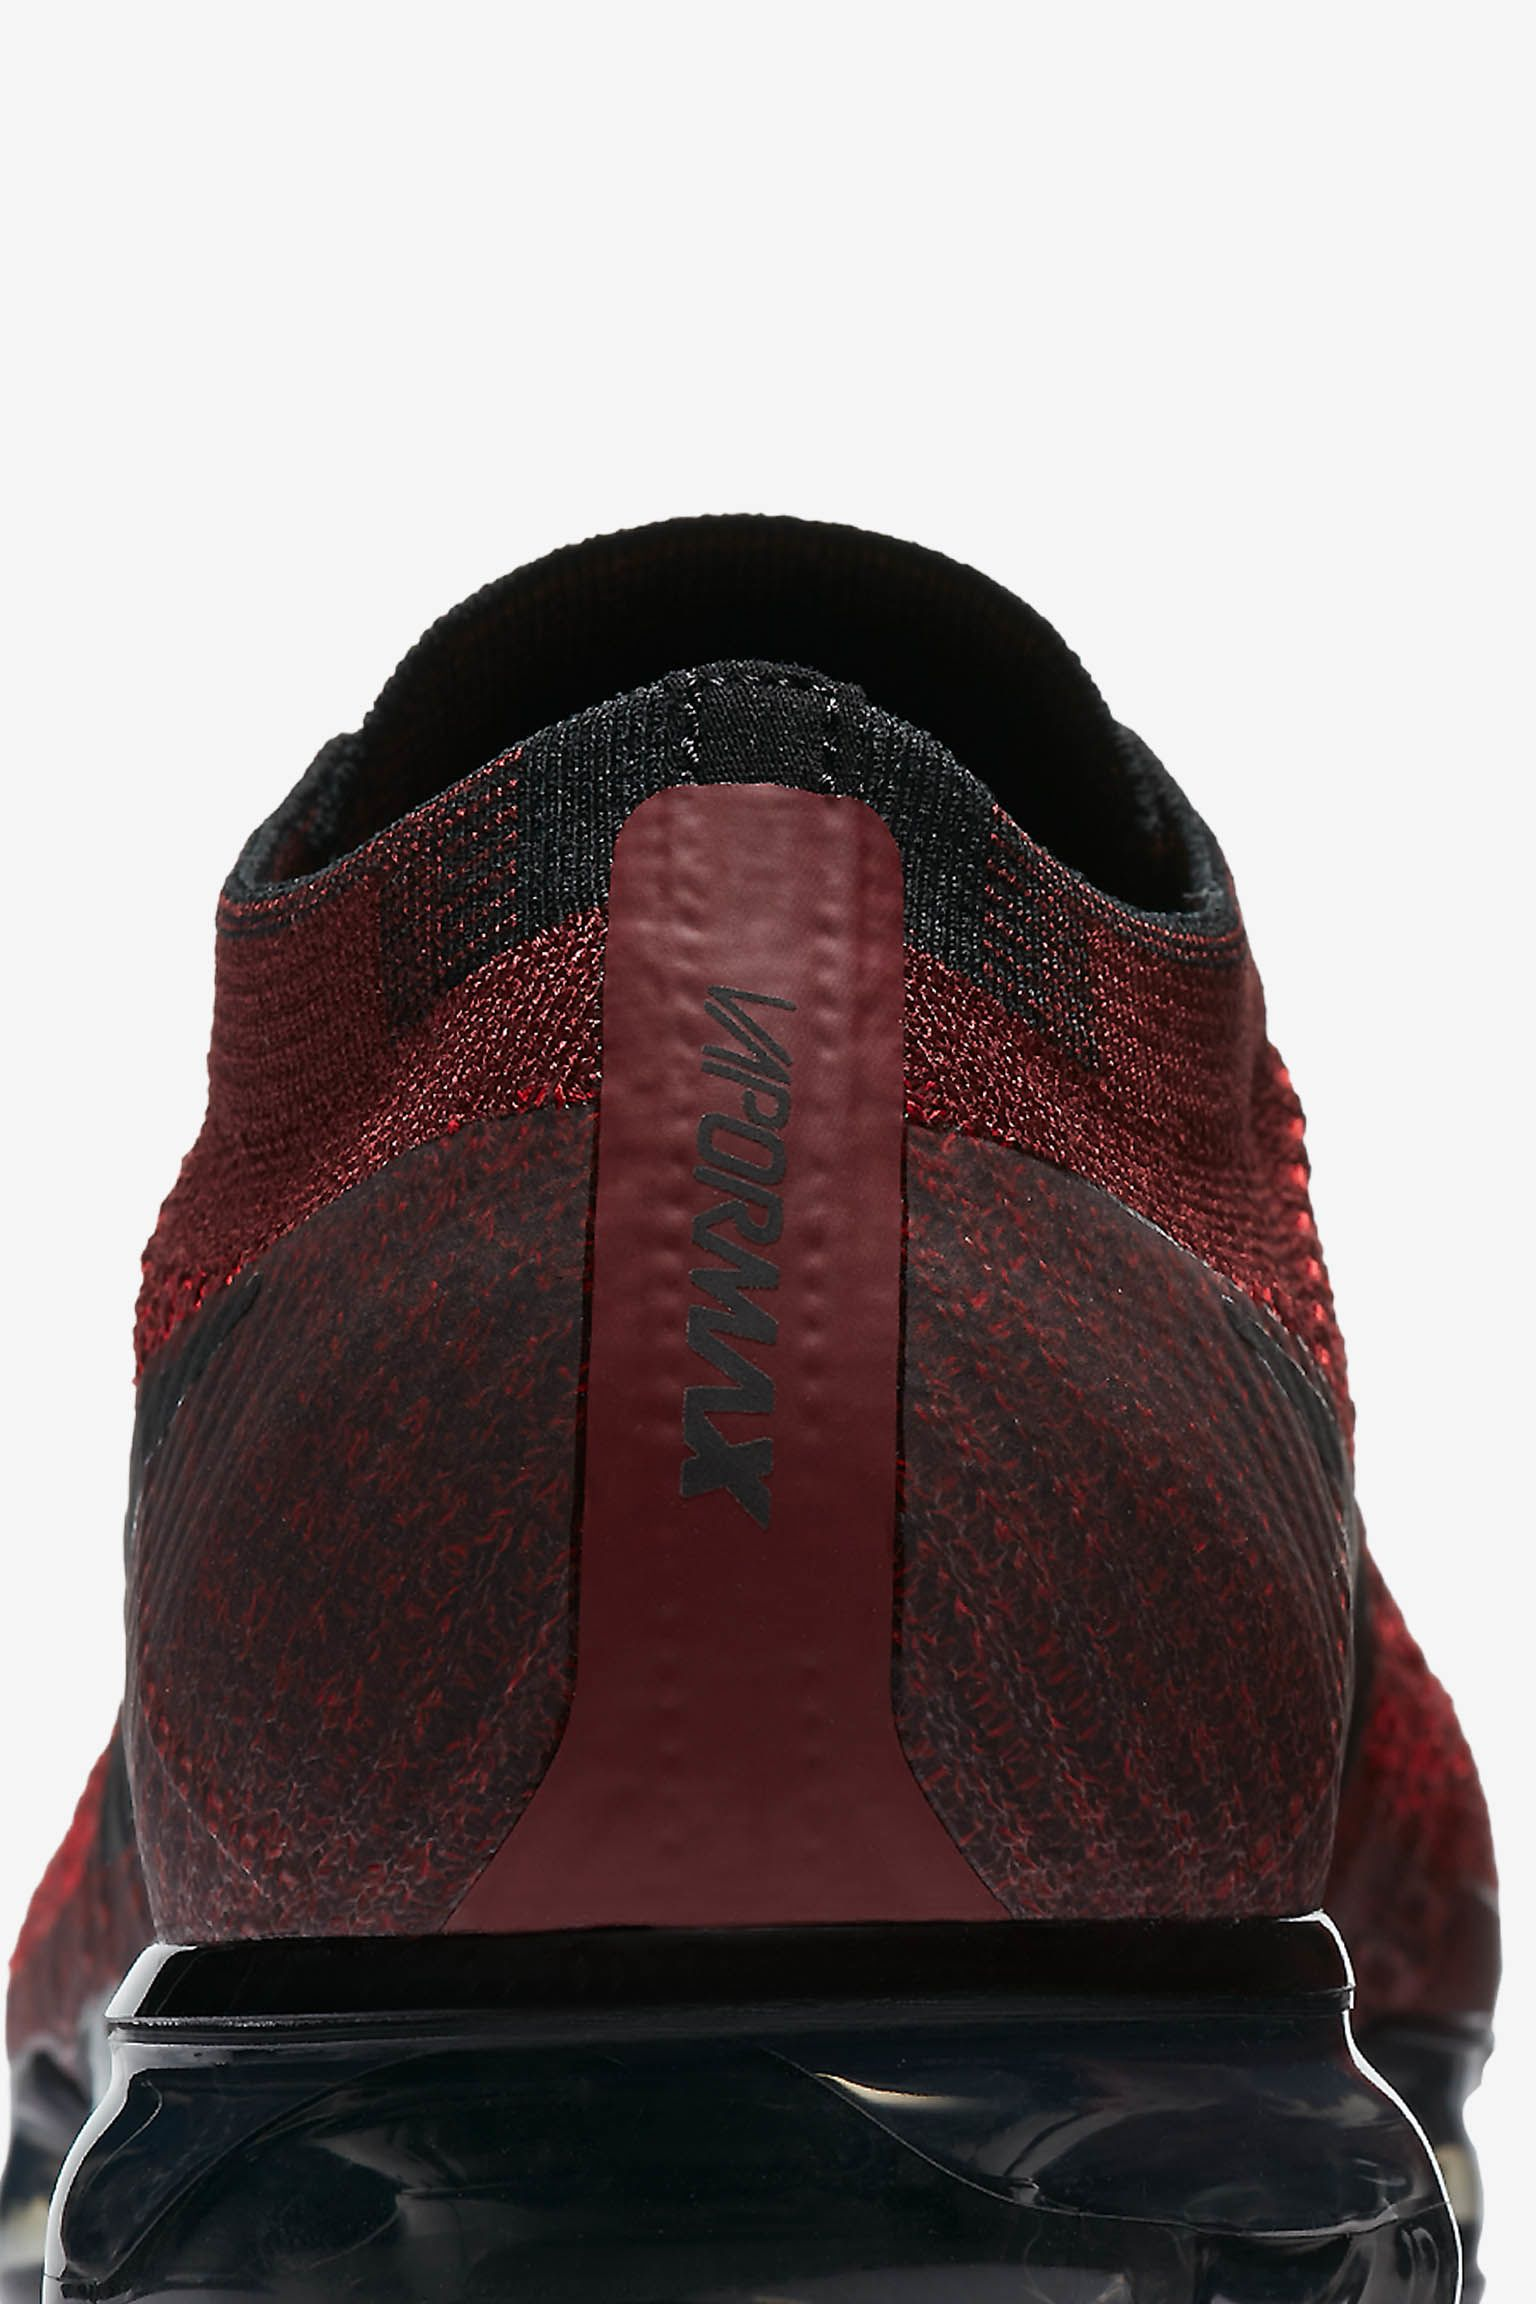 buy popular bf37f 9ade7 ... Nike Air Vapormax Dark Team Red Black ...